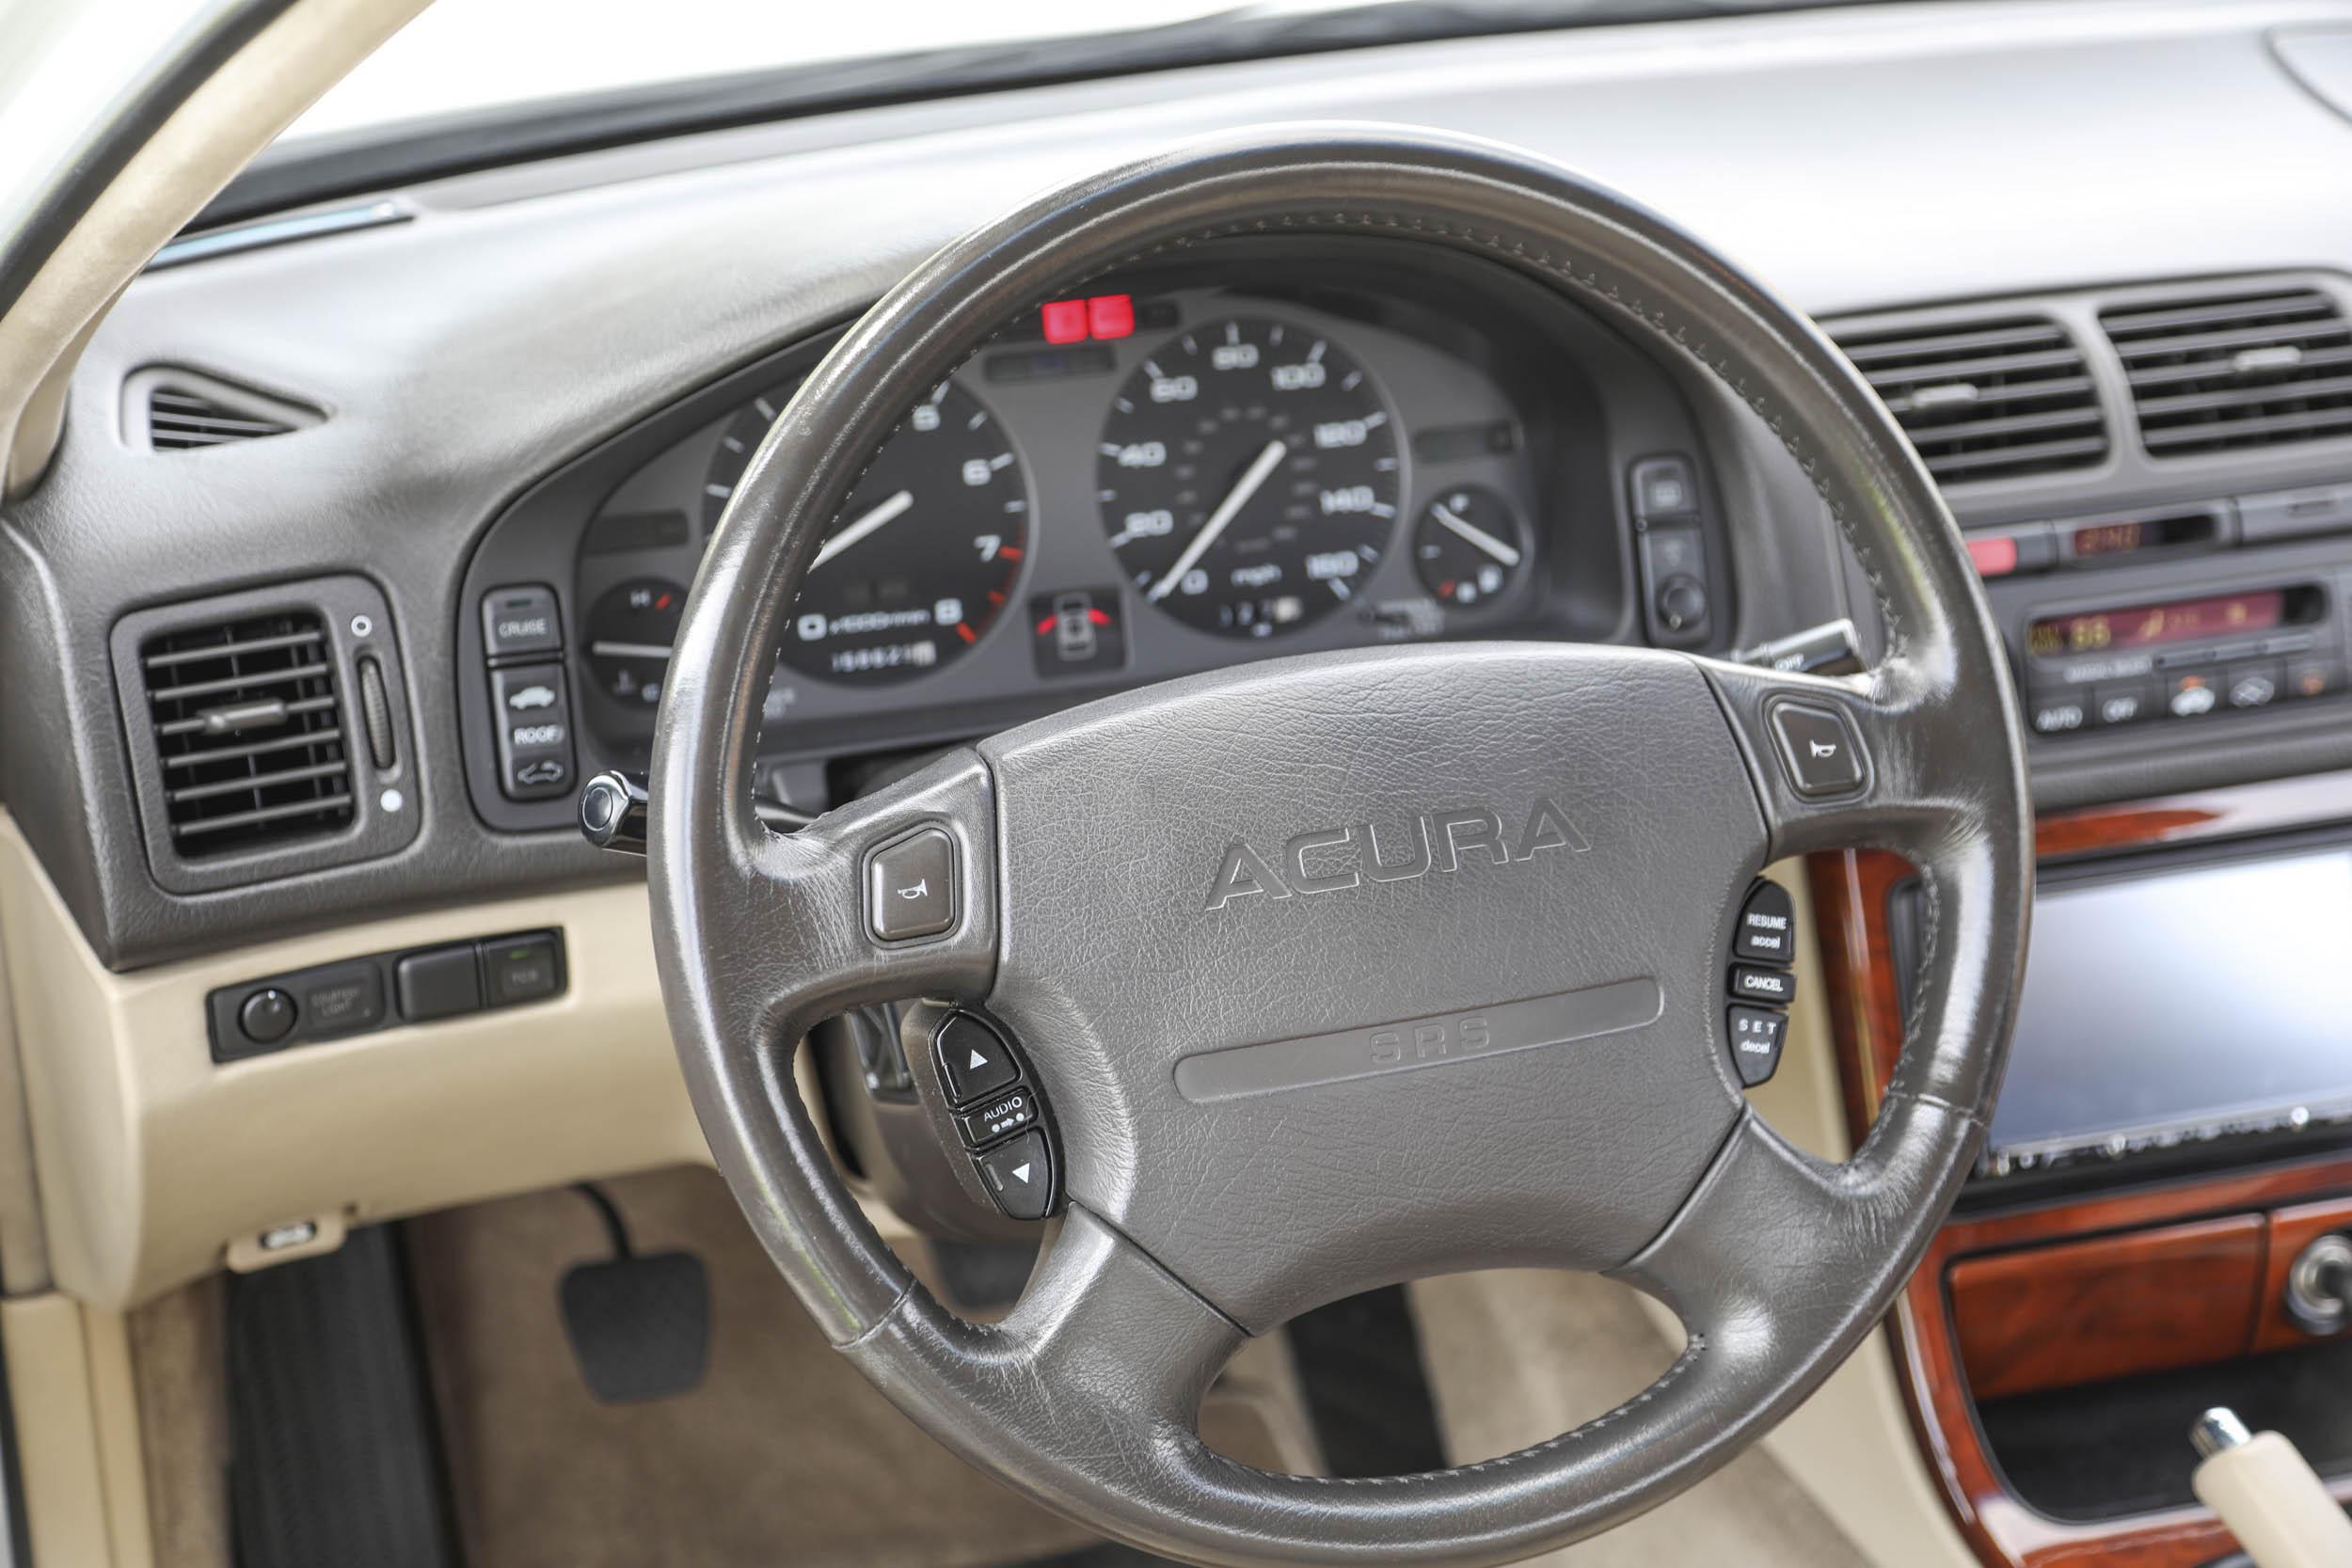 1994 Acura Legend LS steering wheel